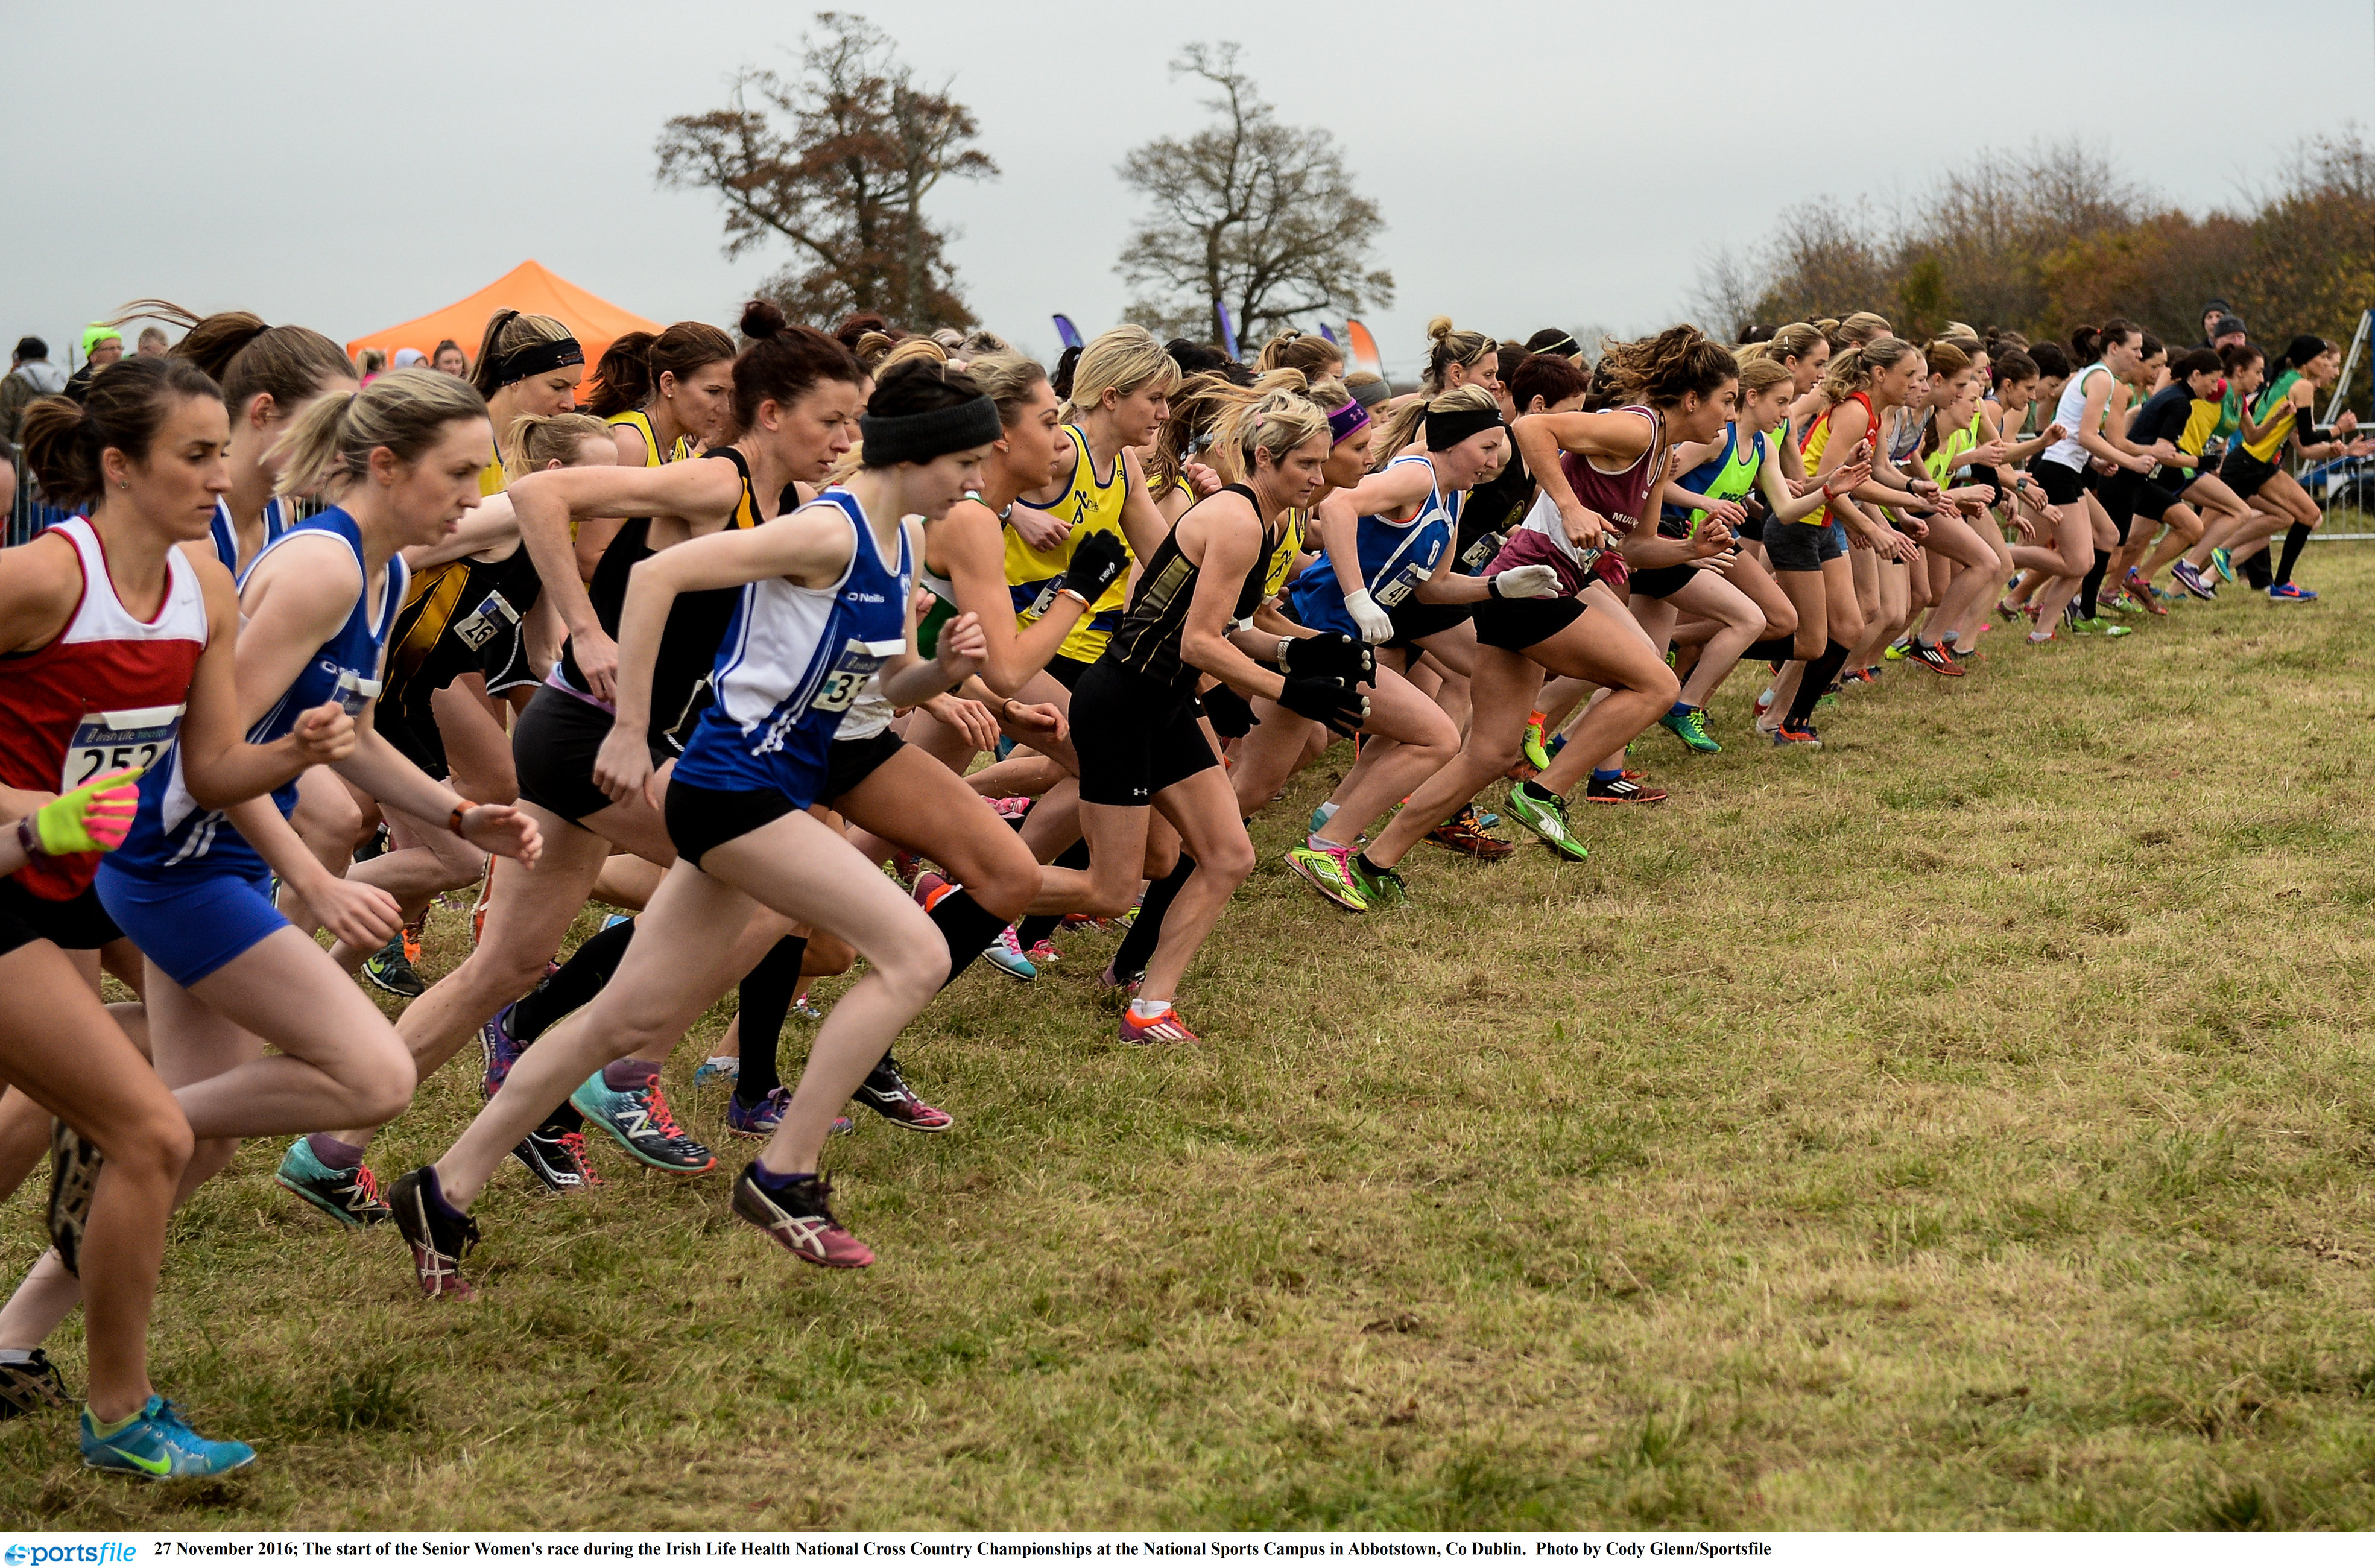 Irish Life Health National Senior & Juvenile Even Age Championships 2017